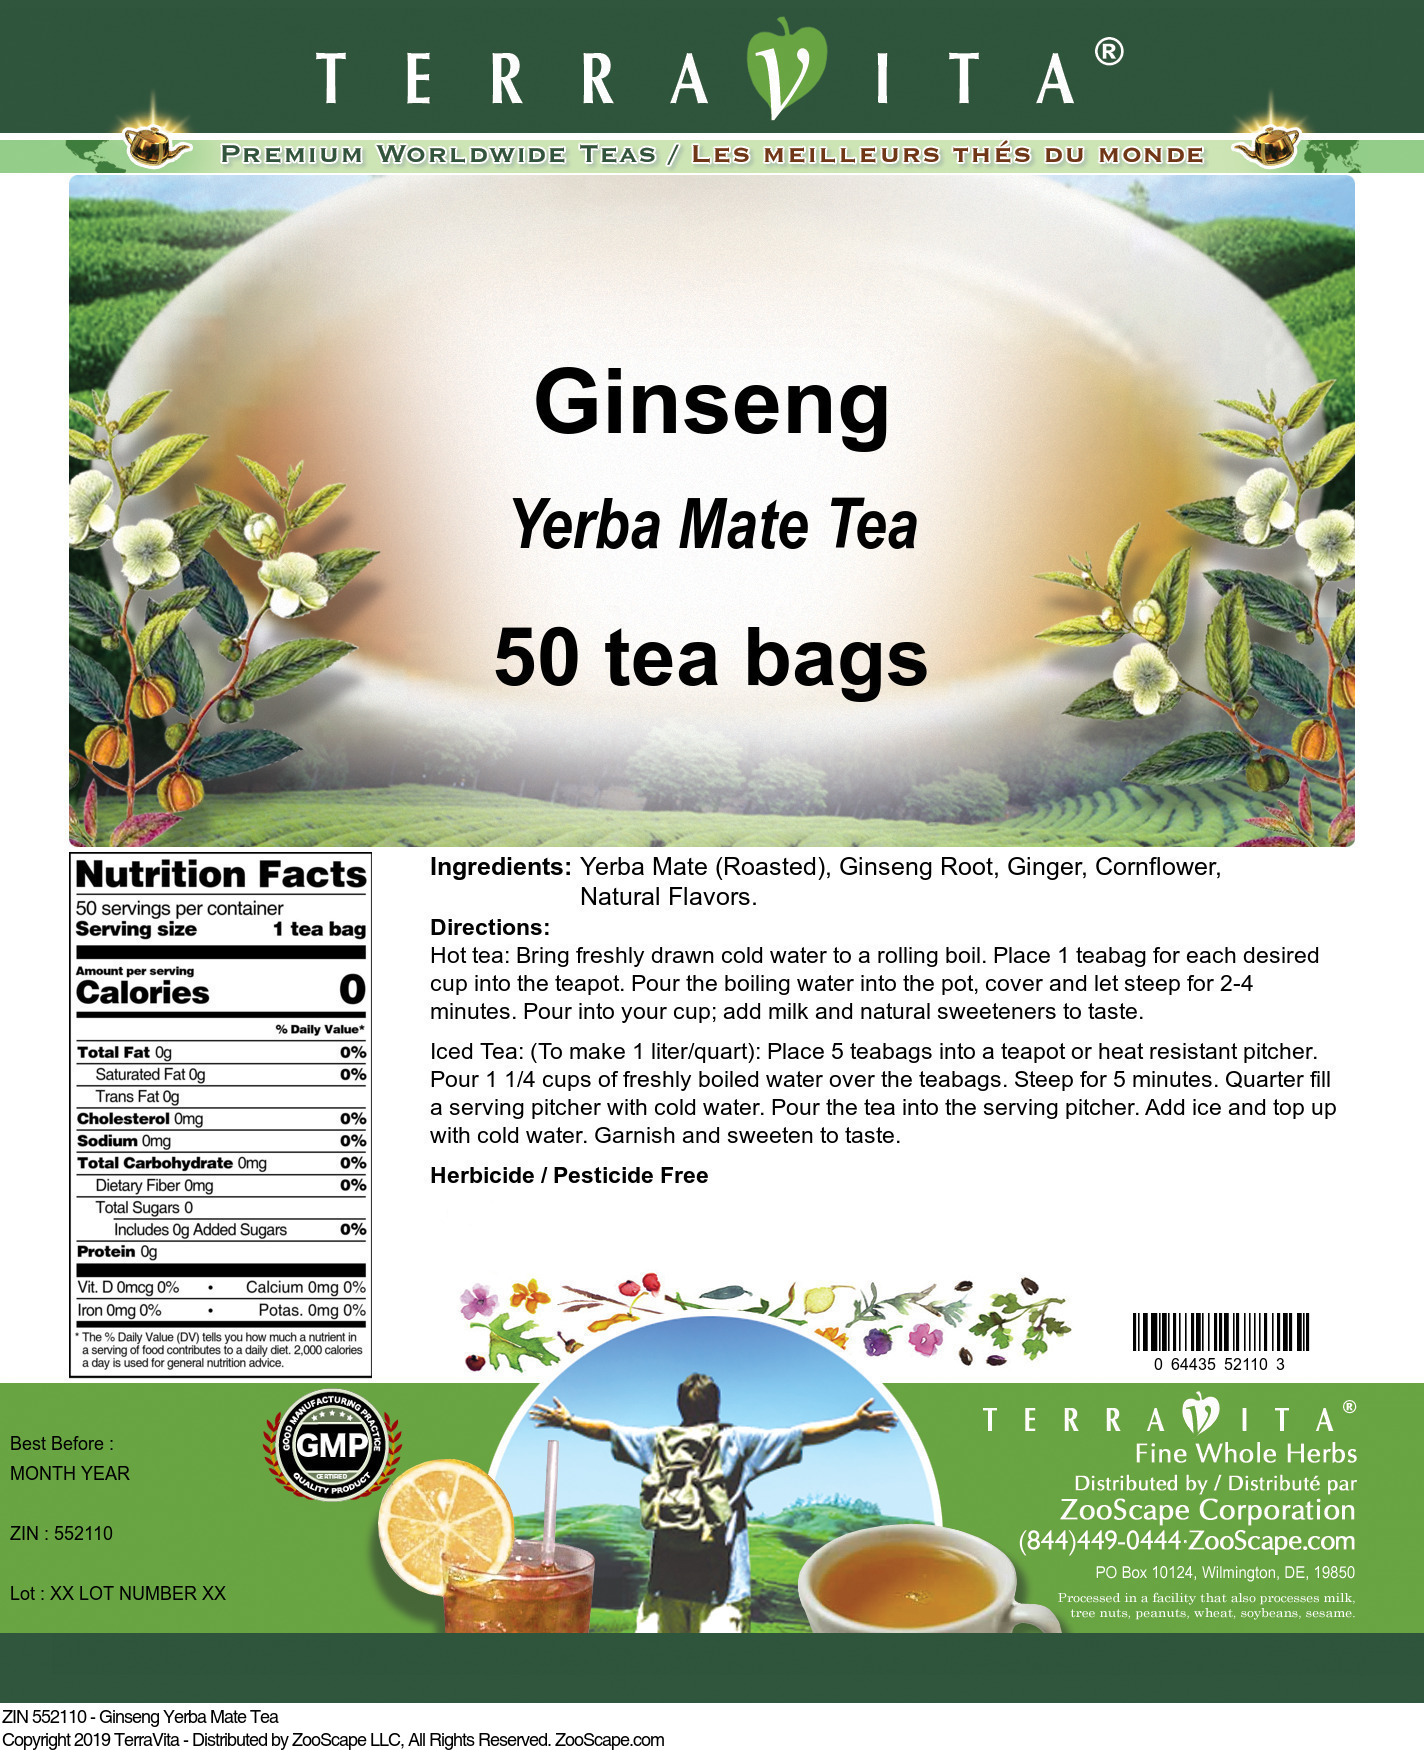 Ginseng Yerba Mate Tea